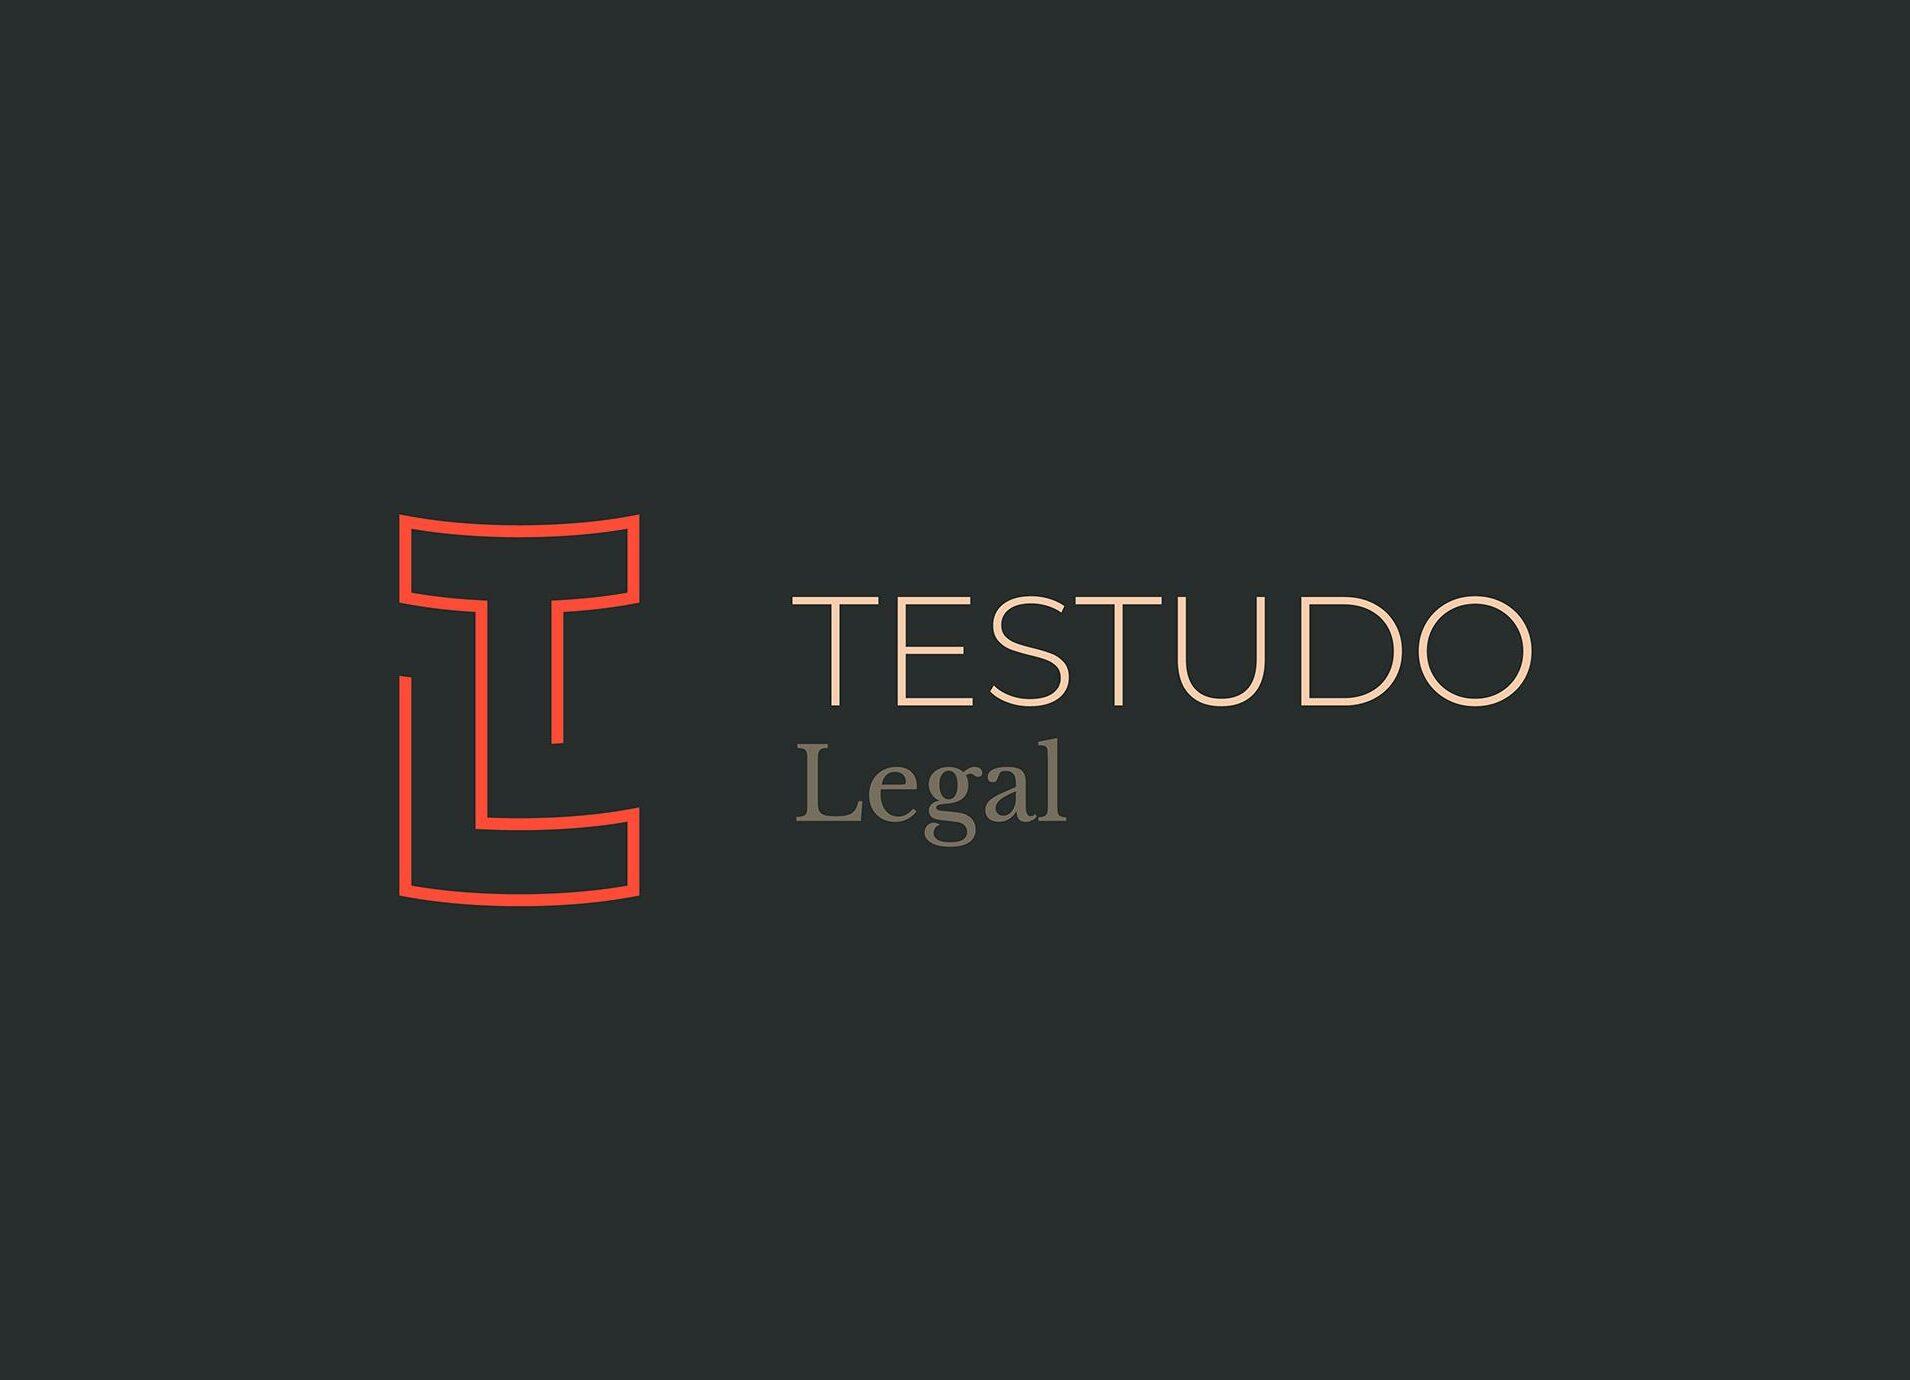 Logo Testudo Legal